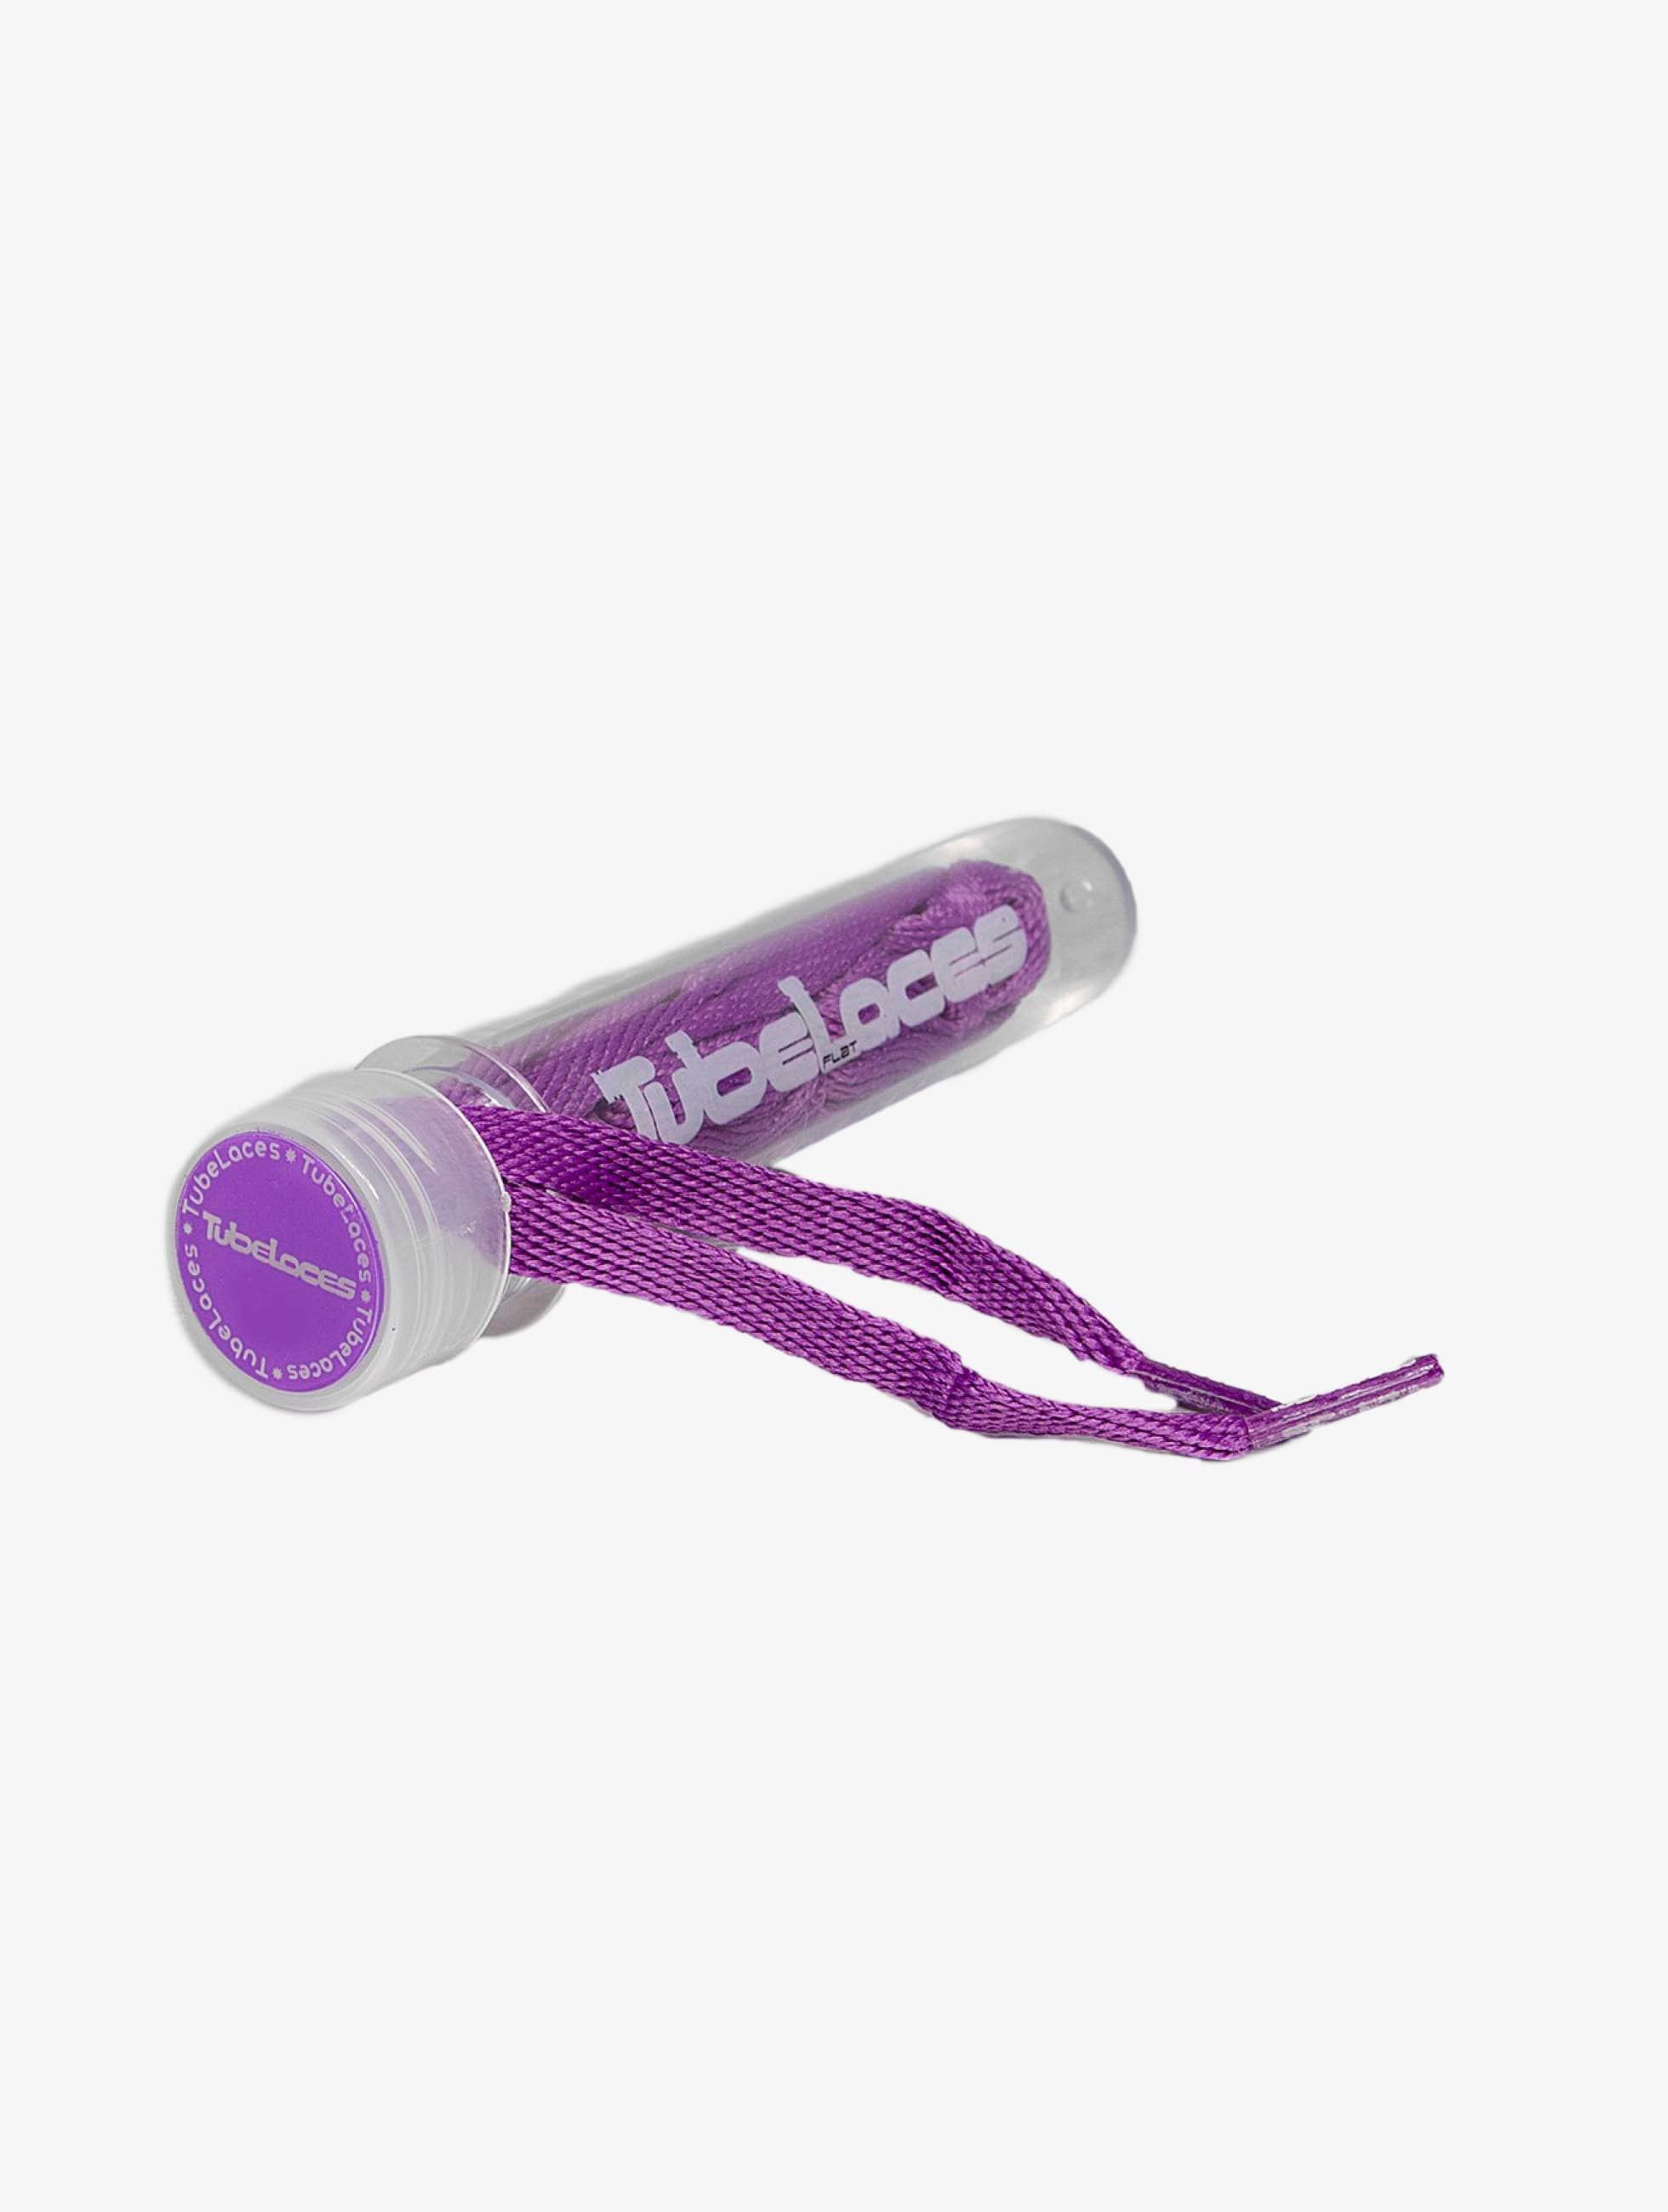 Tubelaces Аксессуар для обуви Flat Laces 140cm пурпурный